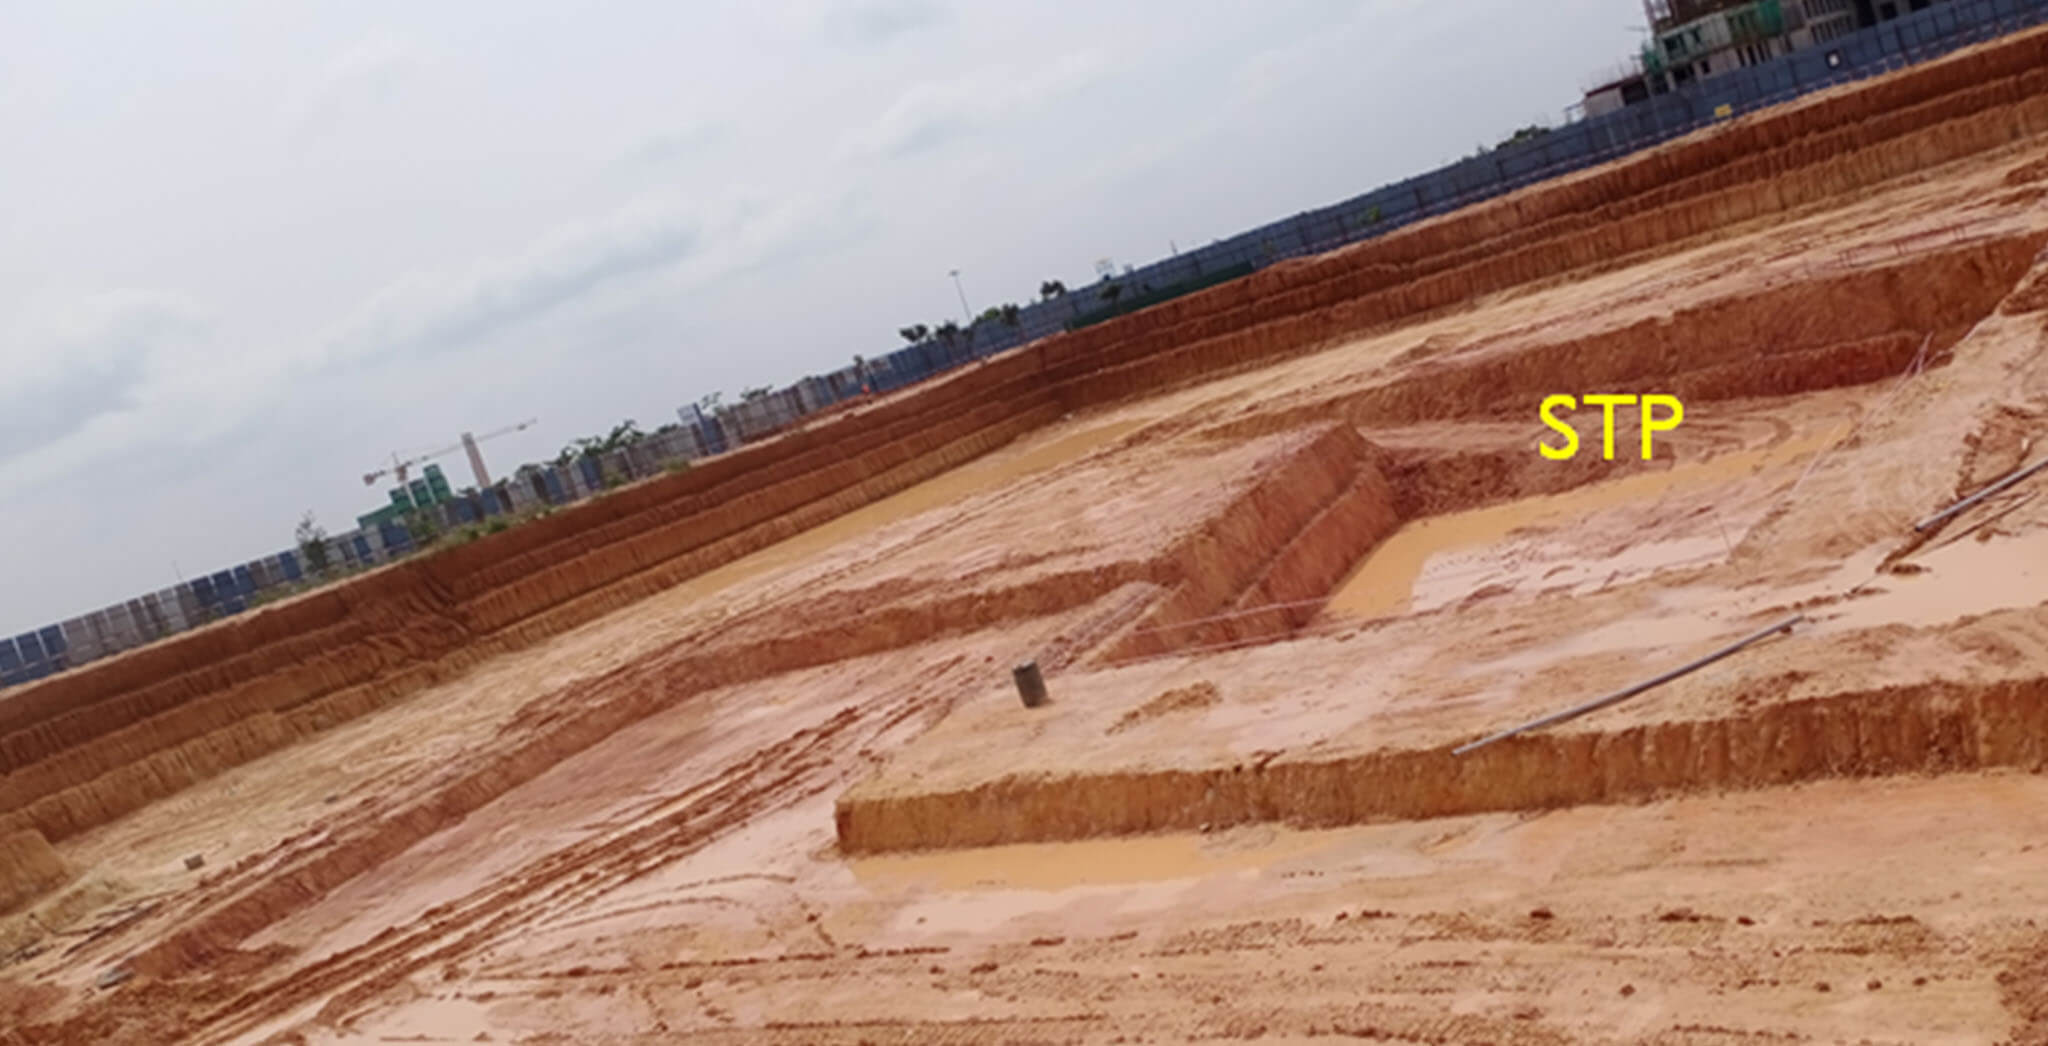 Wing B footing & STP excavation work-in-progress - Status Images 2